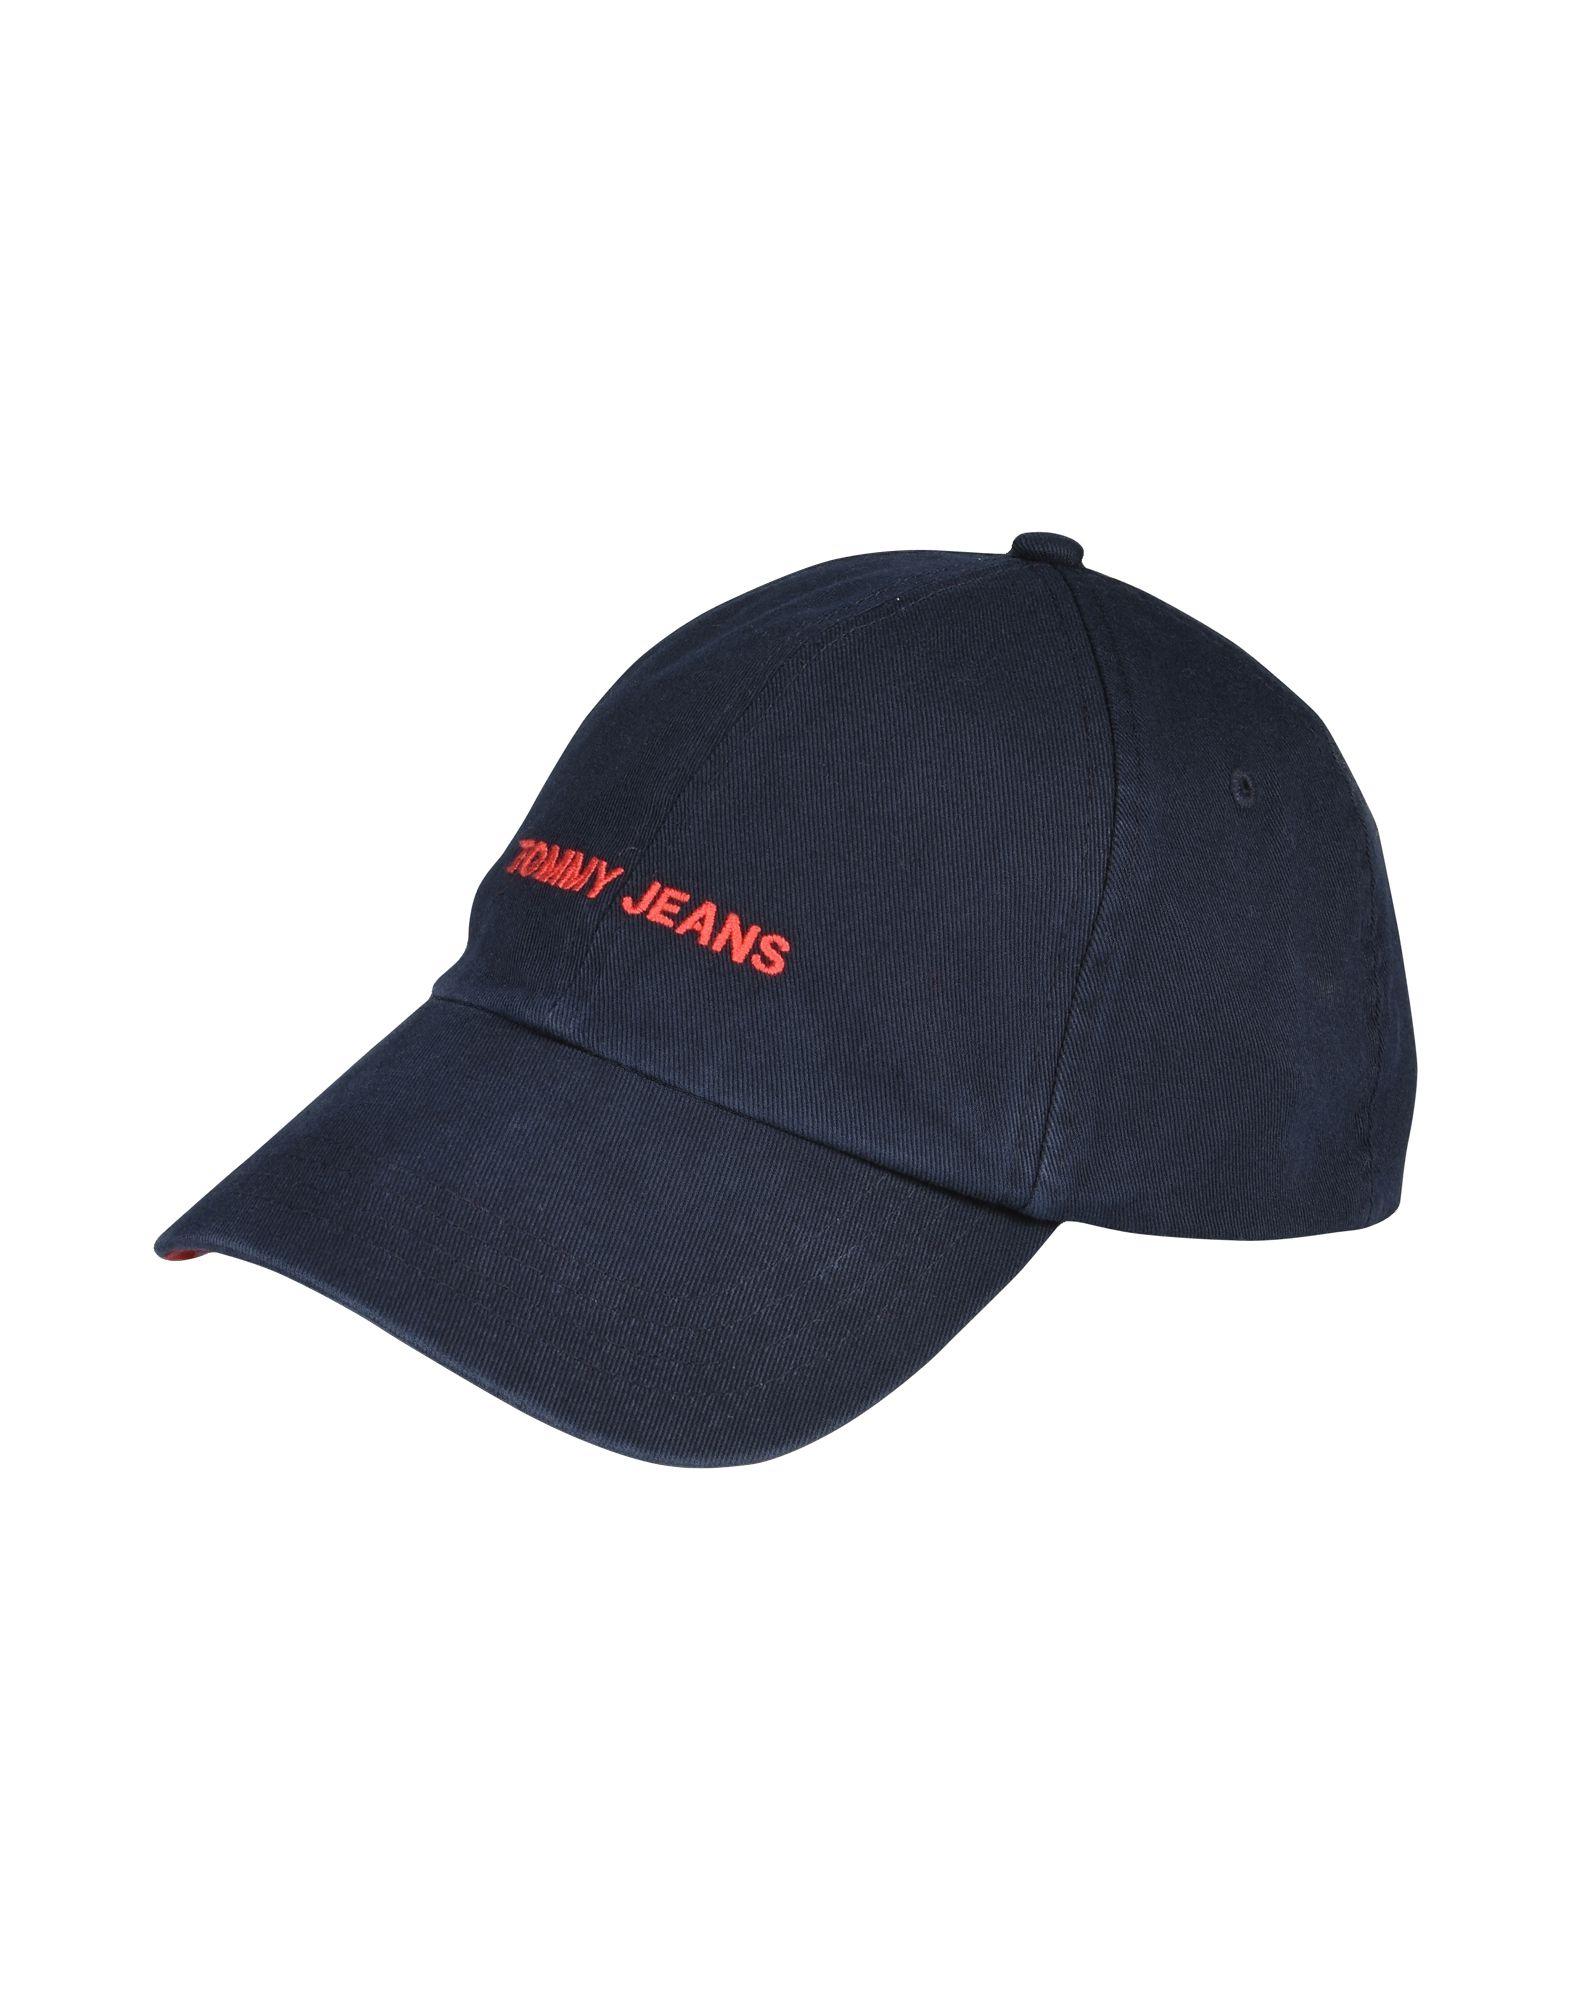 Tommy Jeans Tju Sport Cap - Hat - Men Tommy Jeans Hats online on ... 4f3c980593e